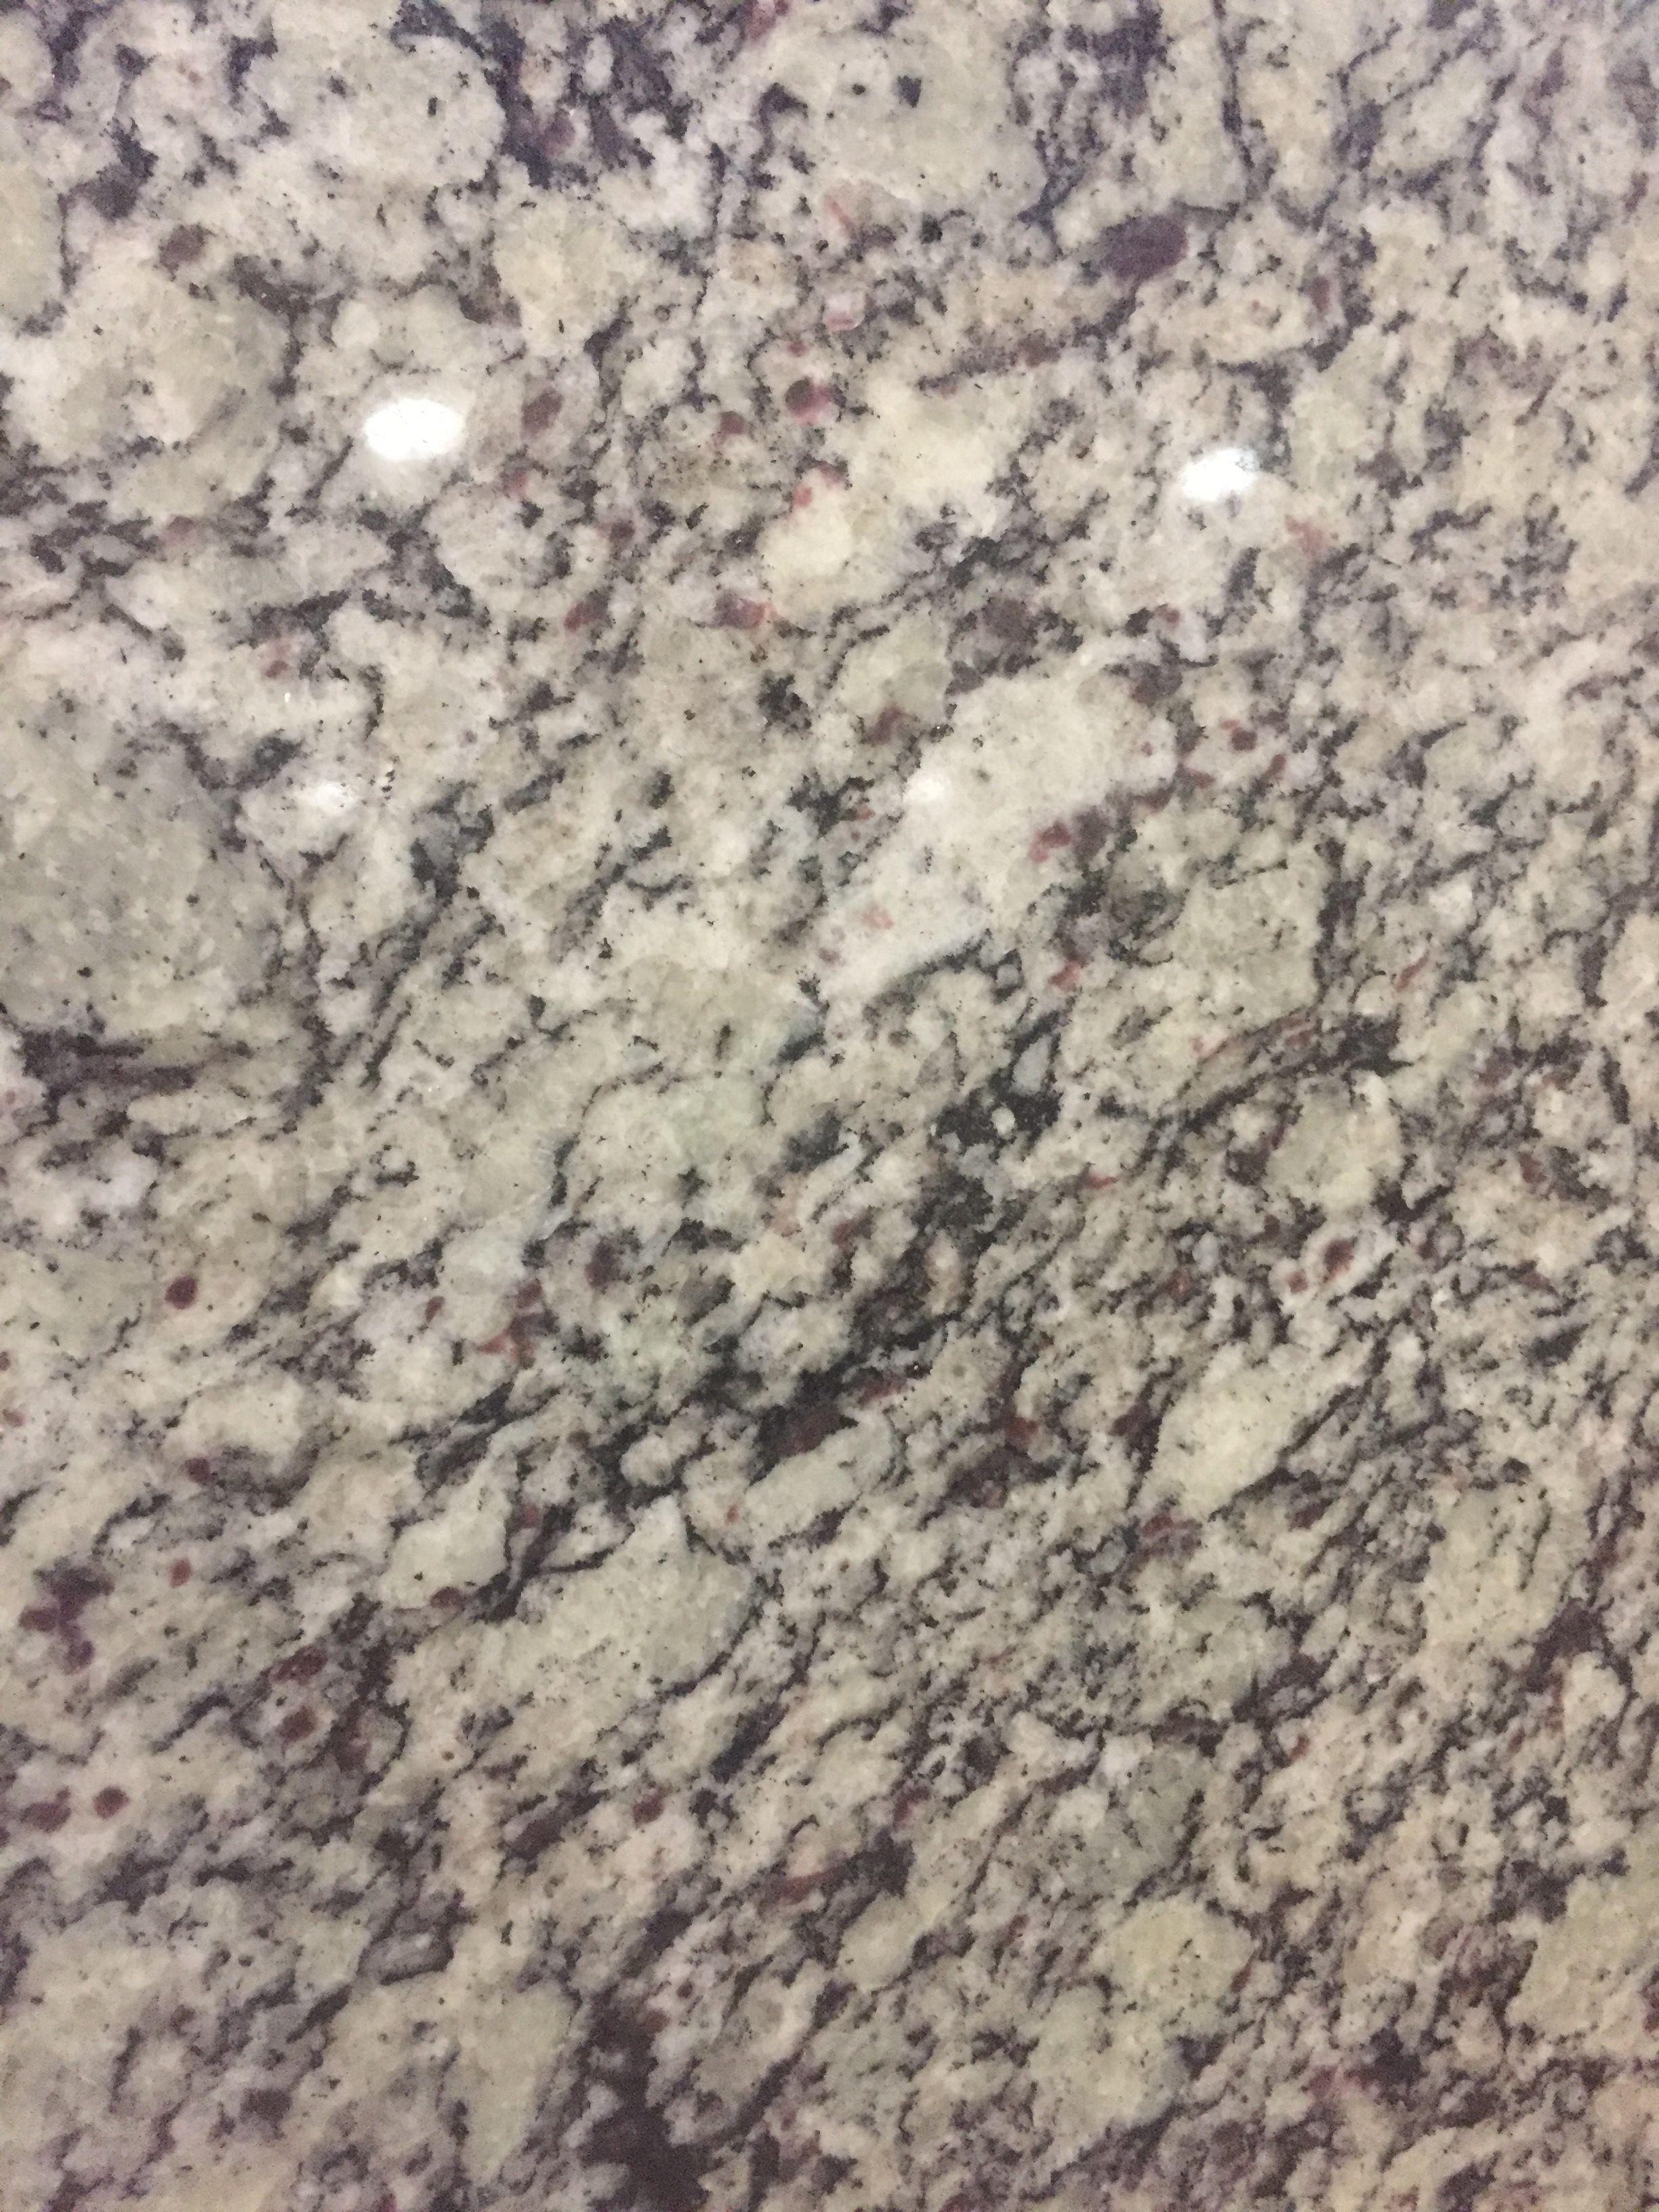 Primata White Granite #countertop #countertops #granitecountertops #quartzcountertops #naturalstone #bathroomdesign #bathdesign #bathroomdesigners #kitchendesign #goodfellasgranitellc